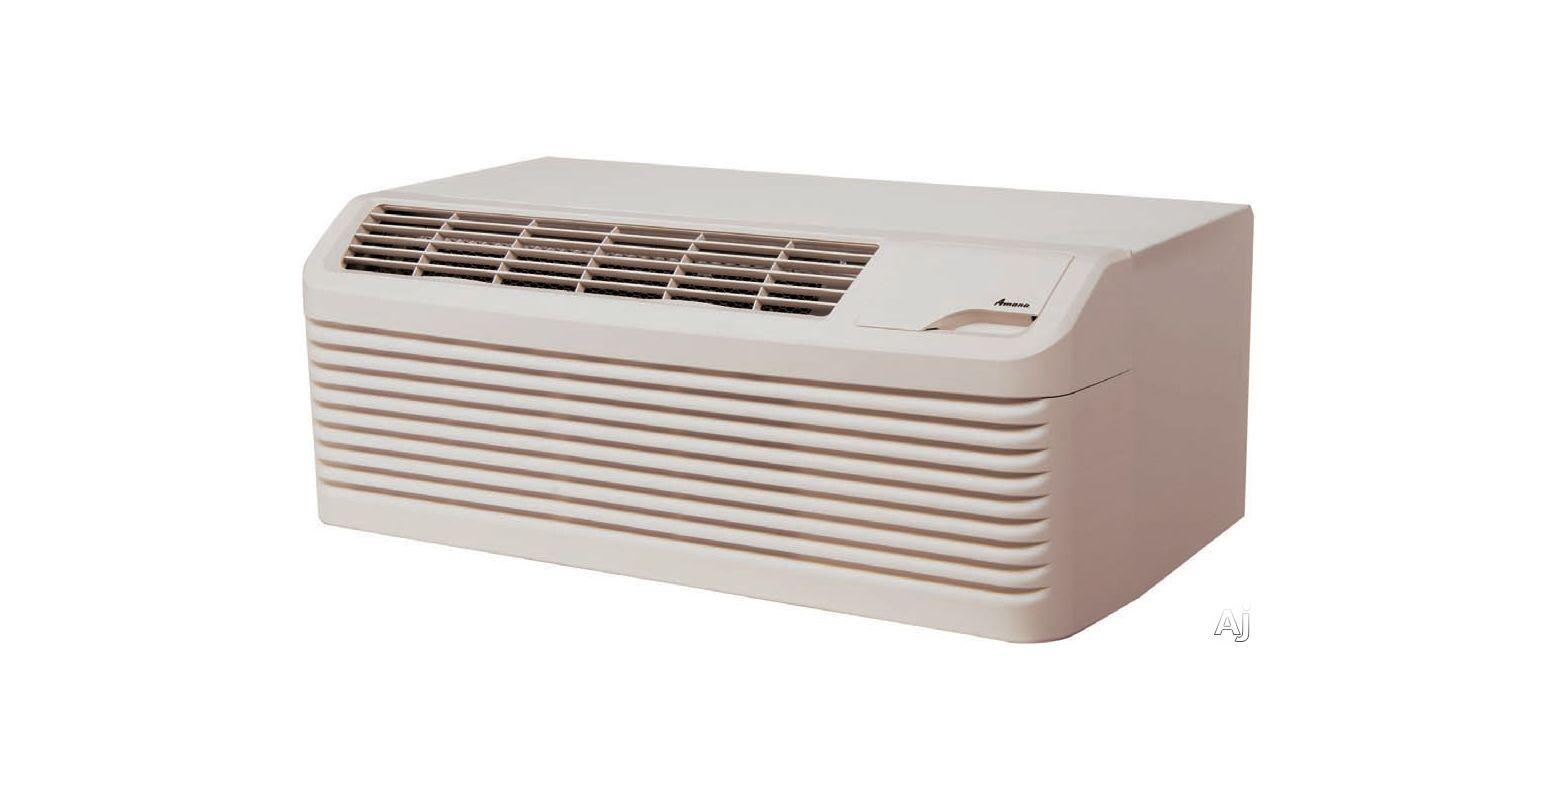 Amana PTC123G35CXXX 12,000 BTU Packaged Terminal Air Conditioner with 3.5 kW Ele photo